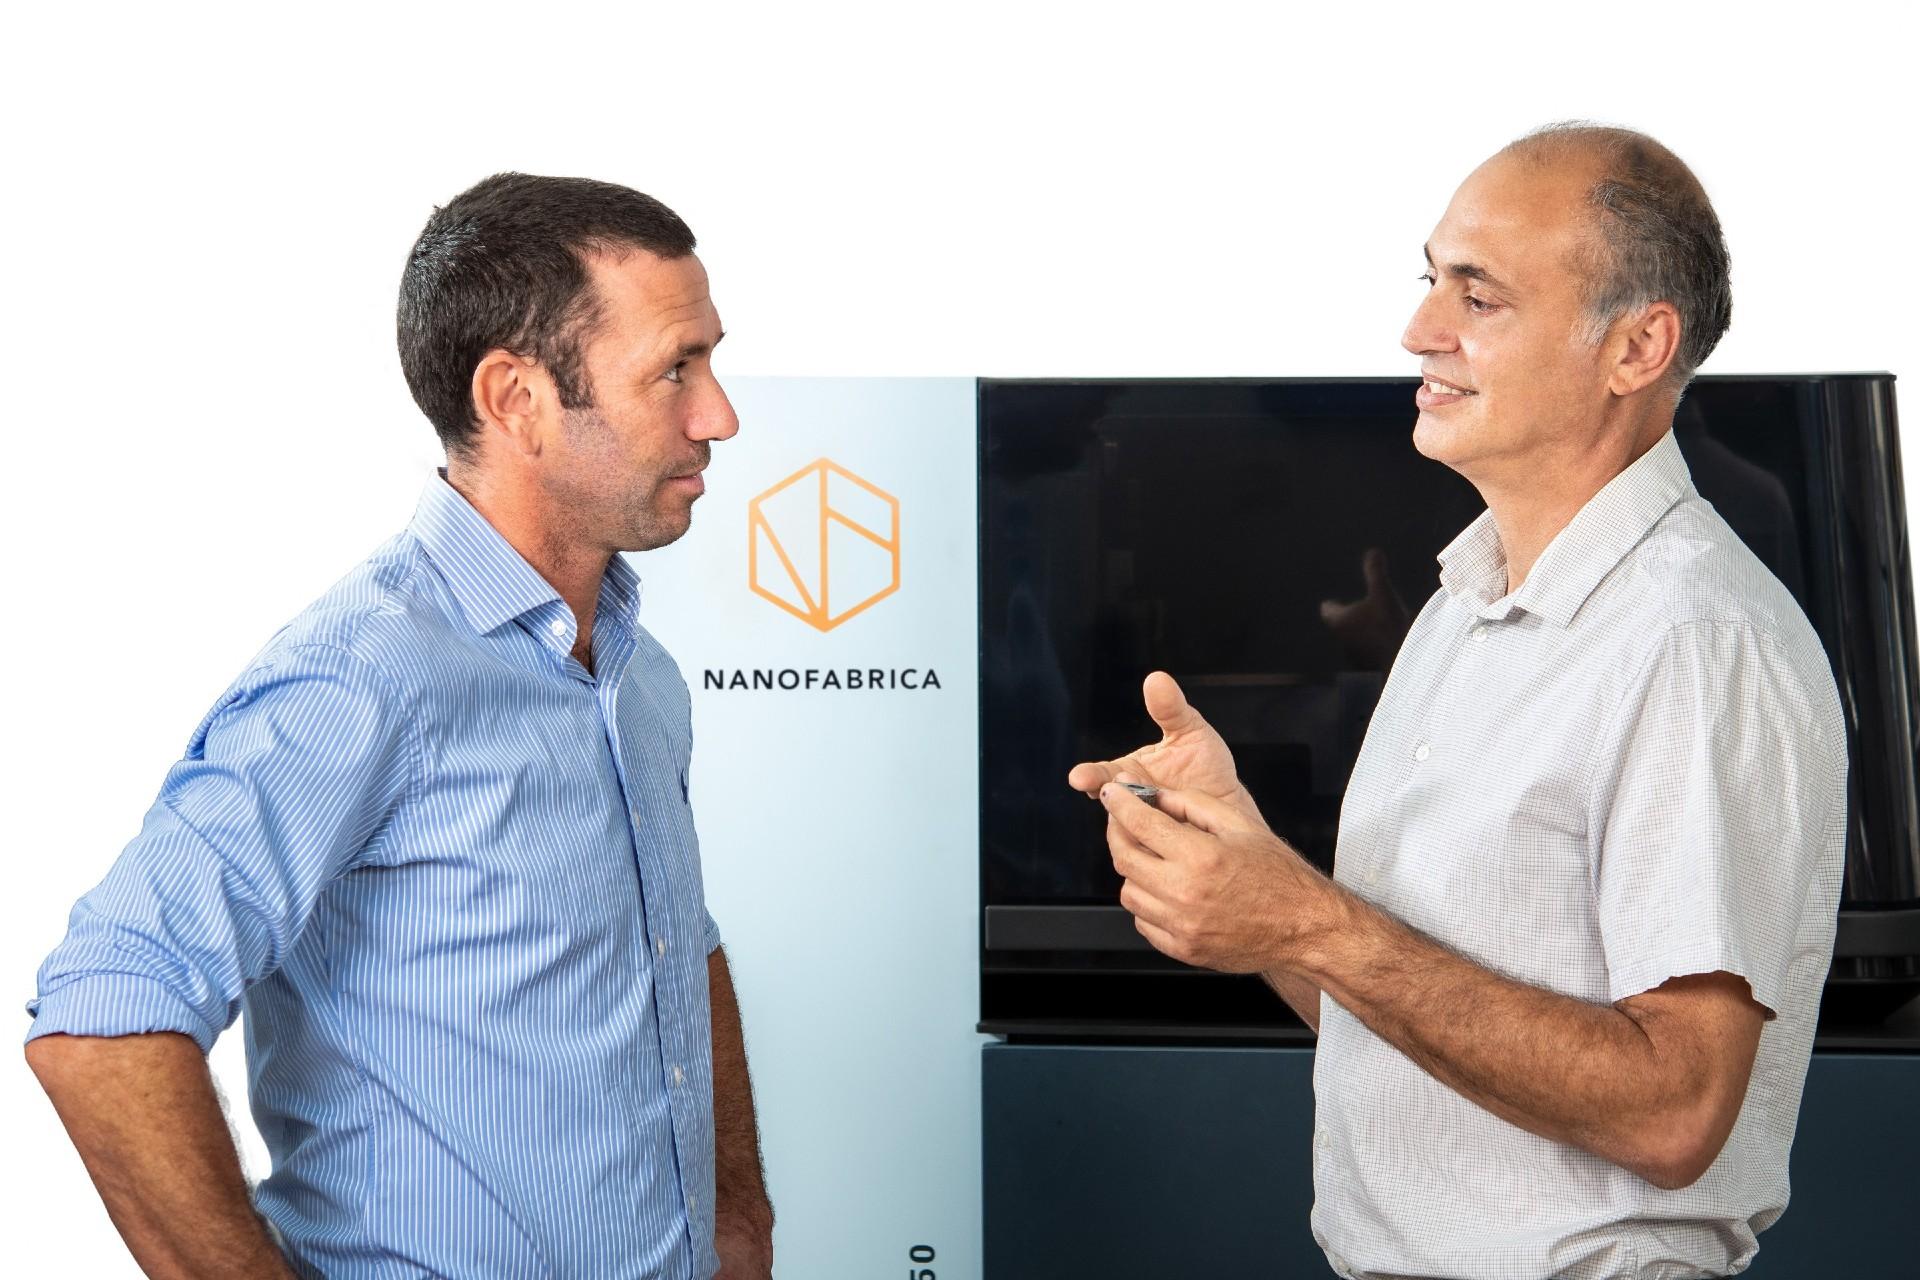 Jon Donner (left) has hailed the importance of hiring Avi Cohen (right) for Nanofabrica's future strategy. Photo via Nanofabrica.